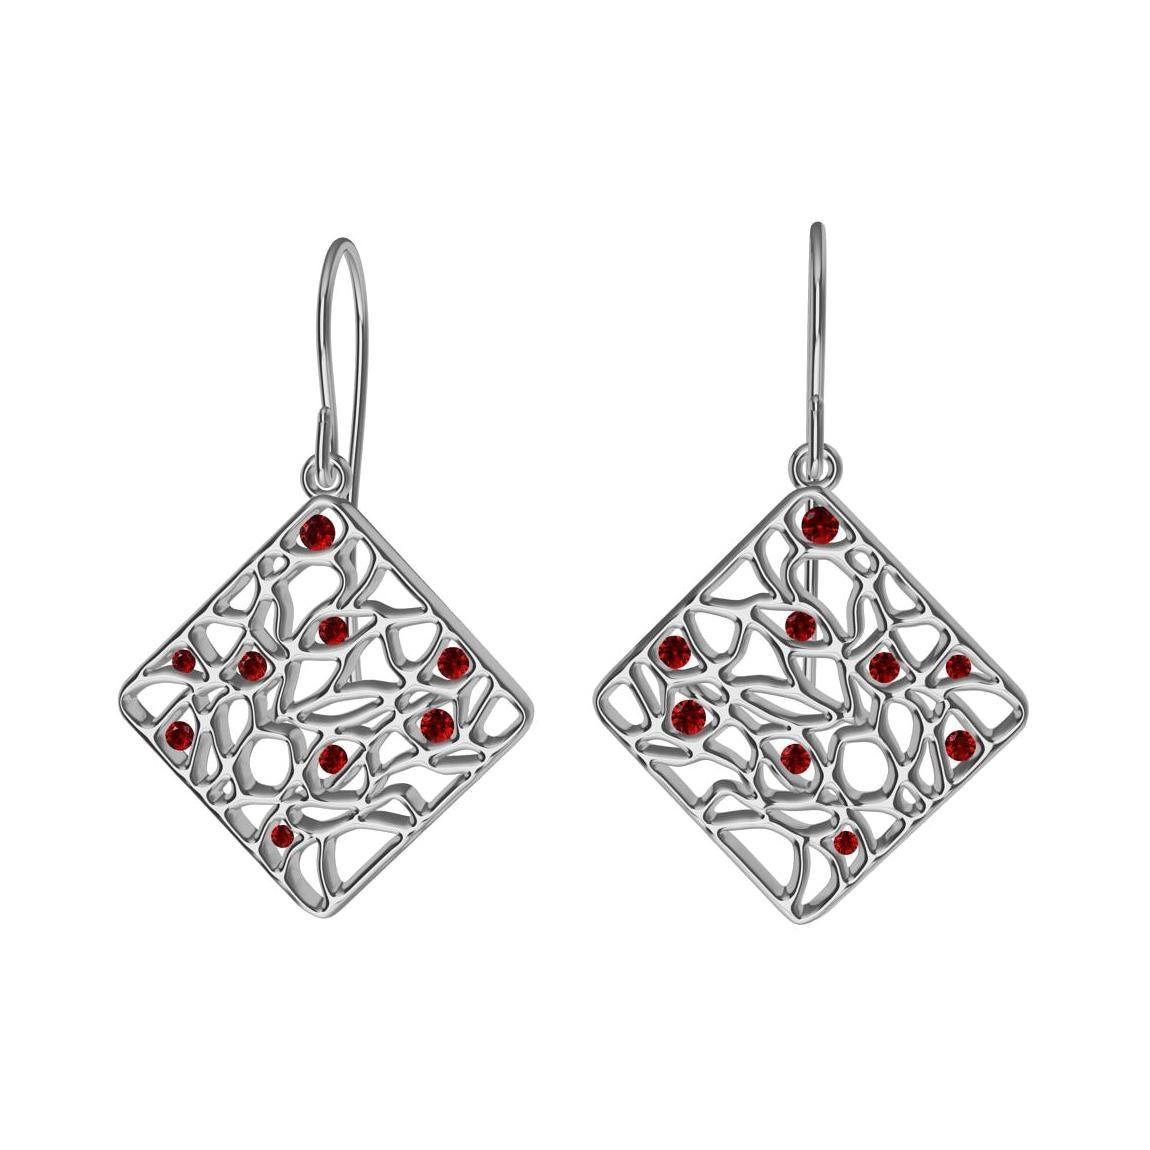 18 Karat White Gold and Rubies Seaweed Dangle Earrings